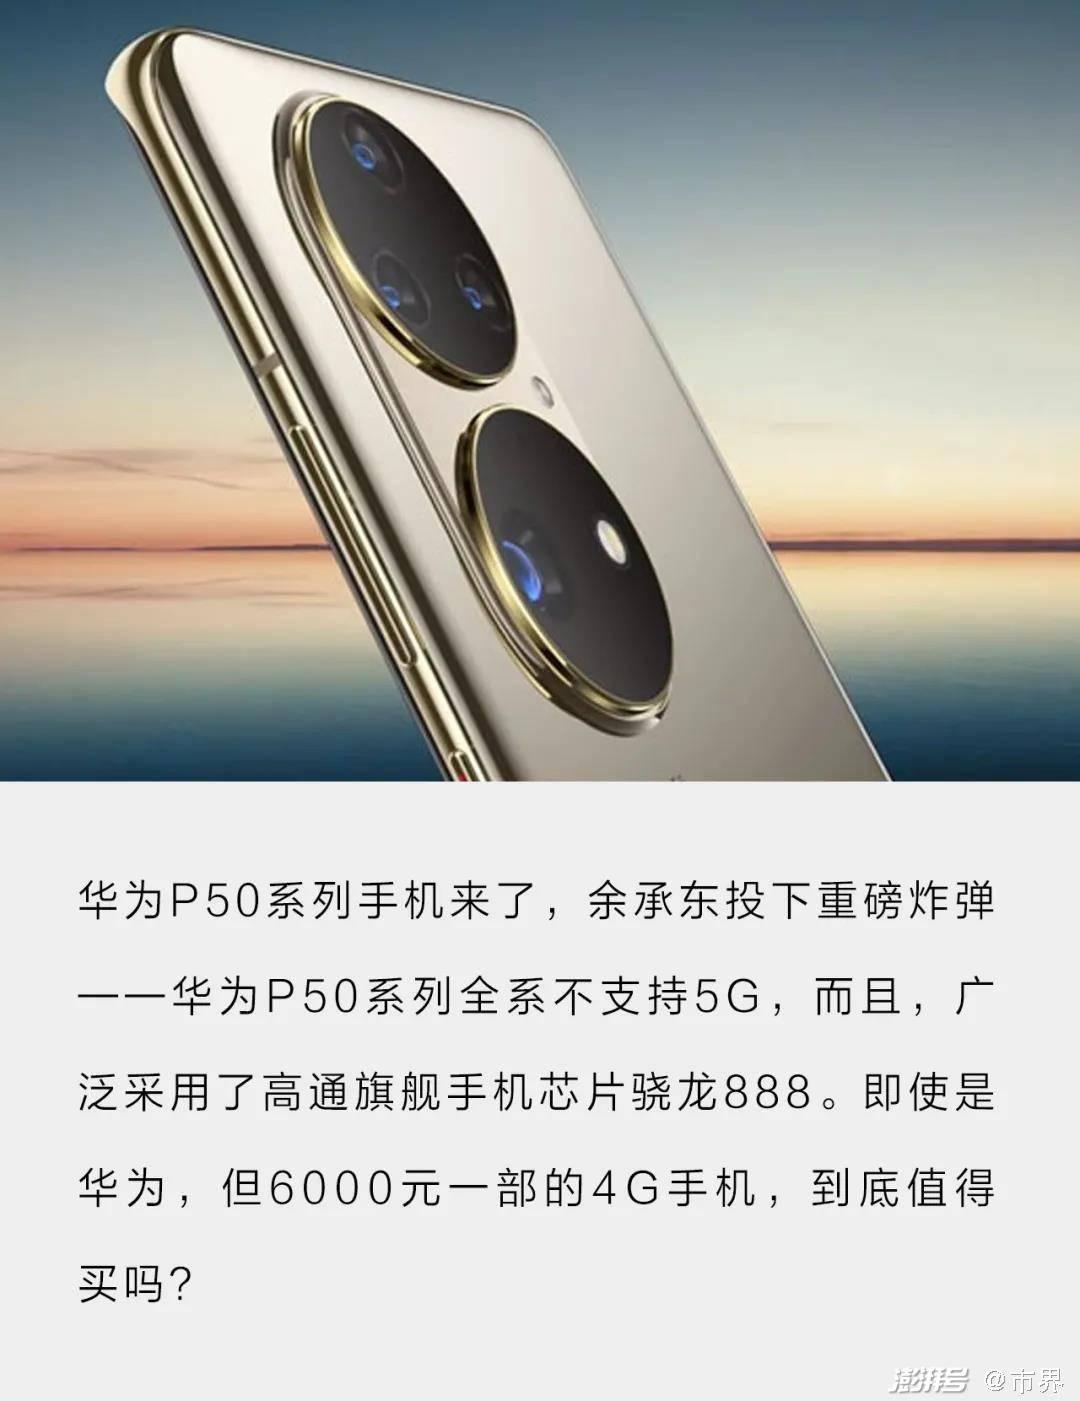 5G领导者华为,为什么推了一款只能用4G的P50?